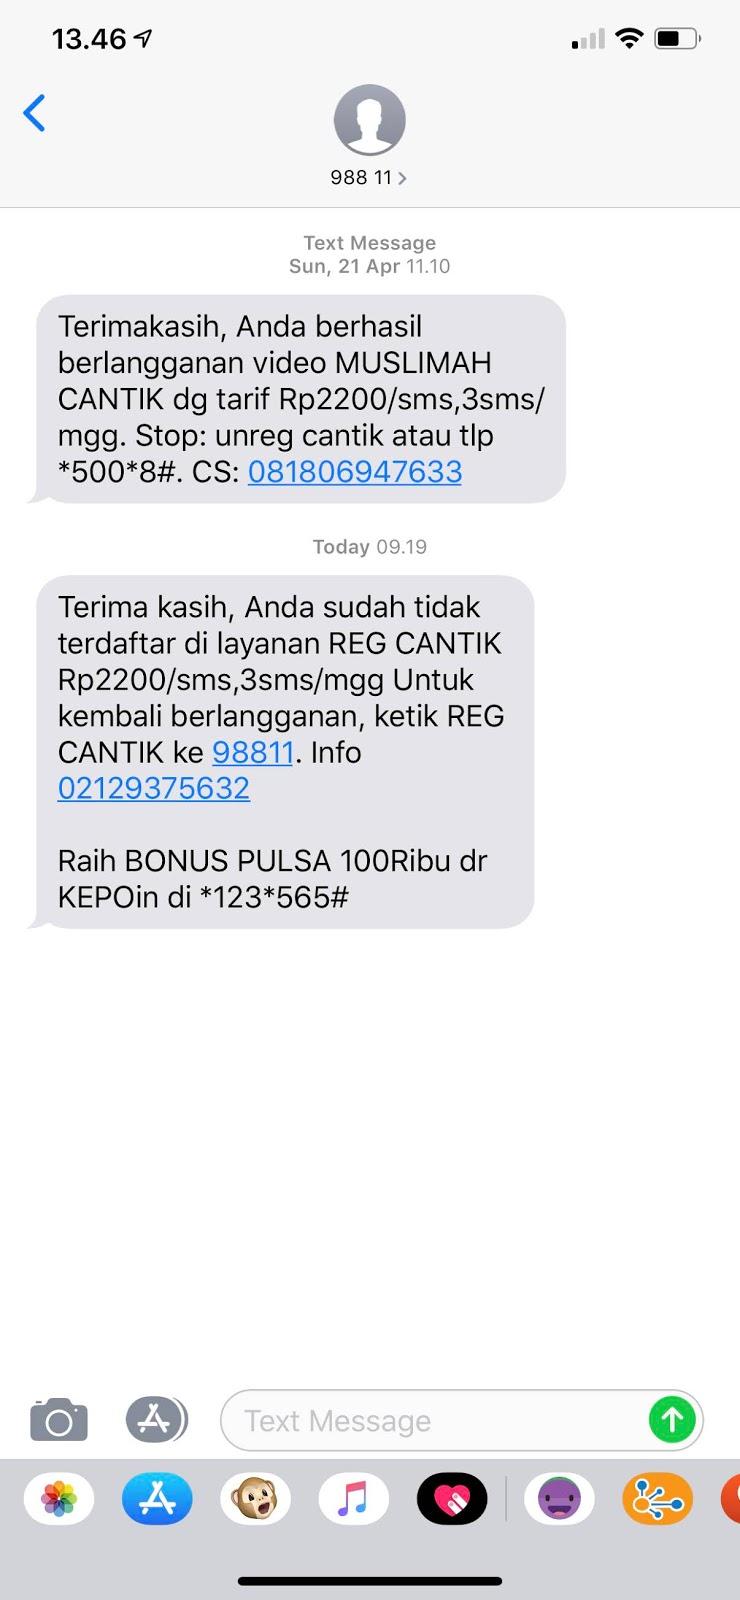 Sms Penipuan Dari 98811 Ke Nomor Xl